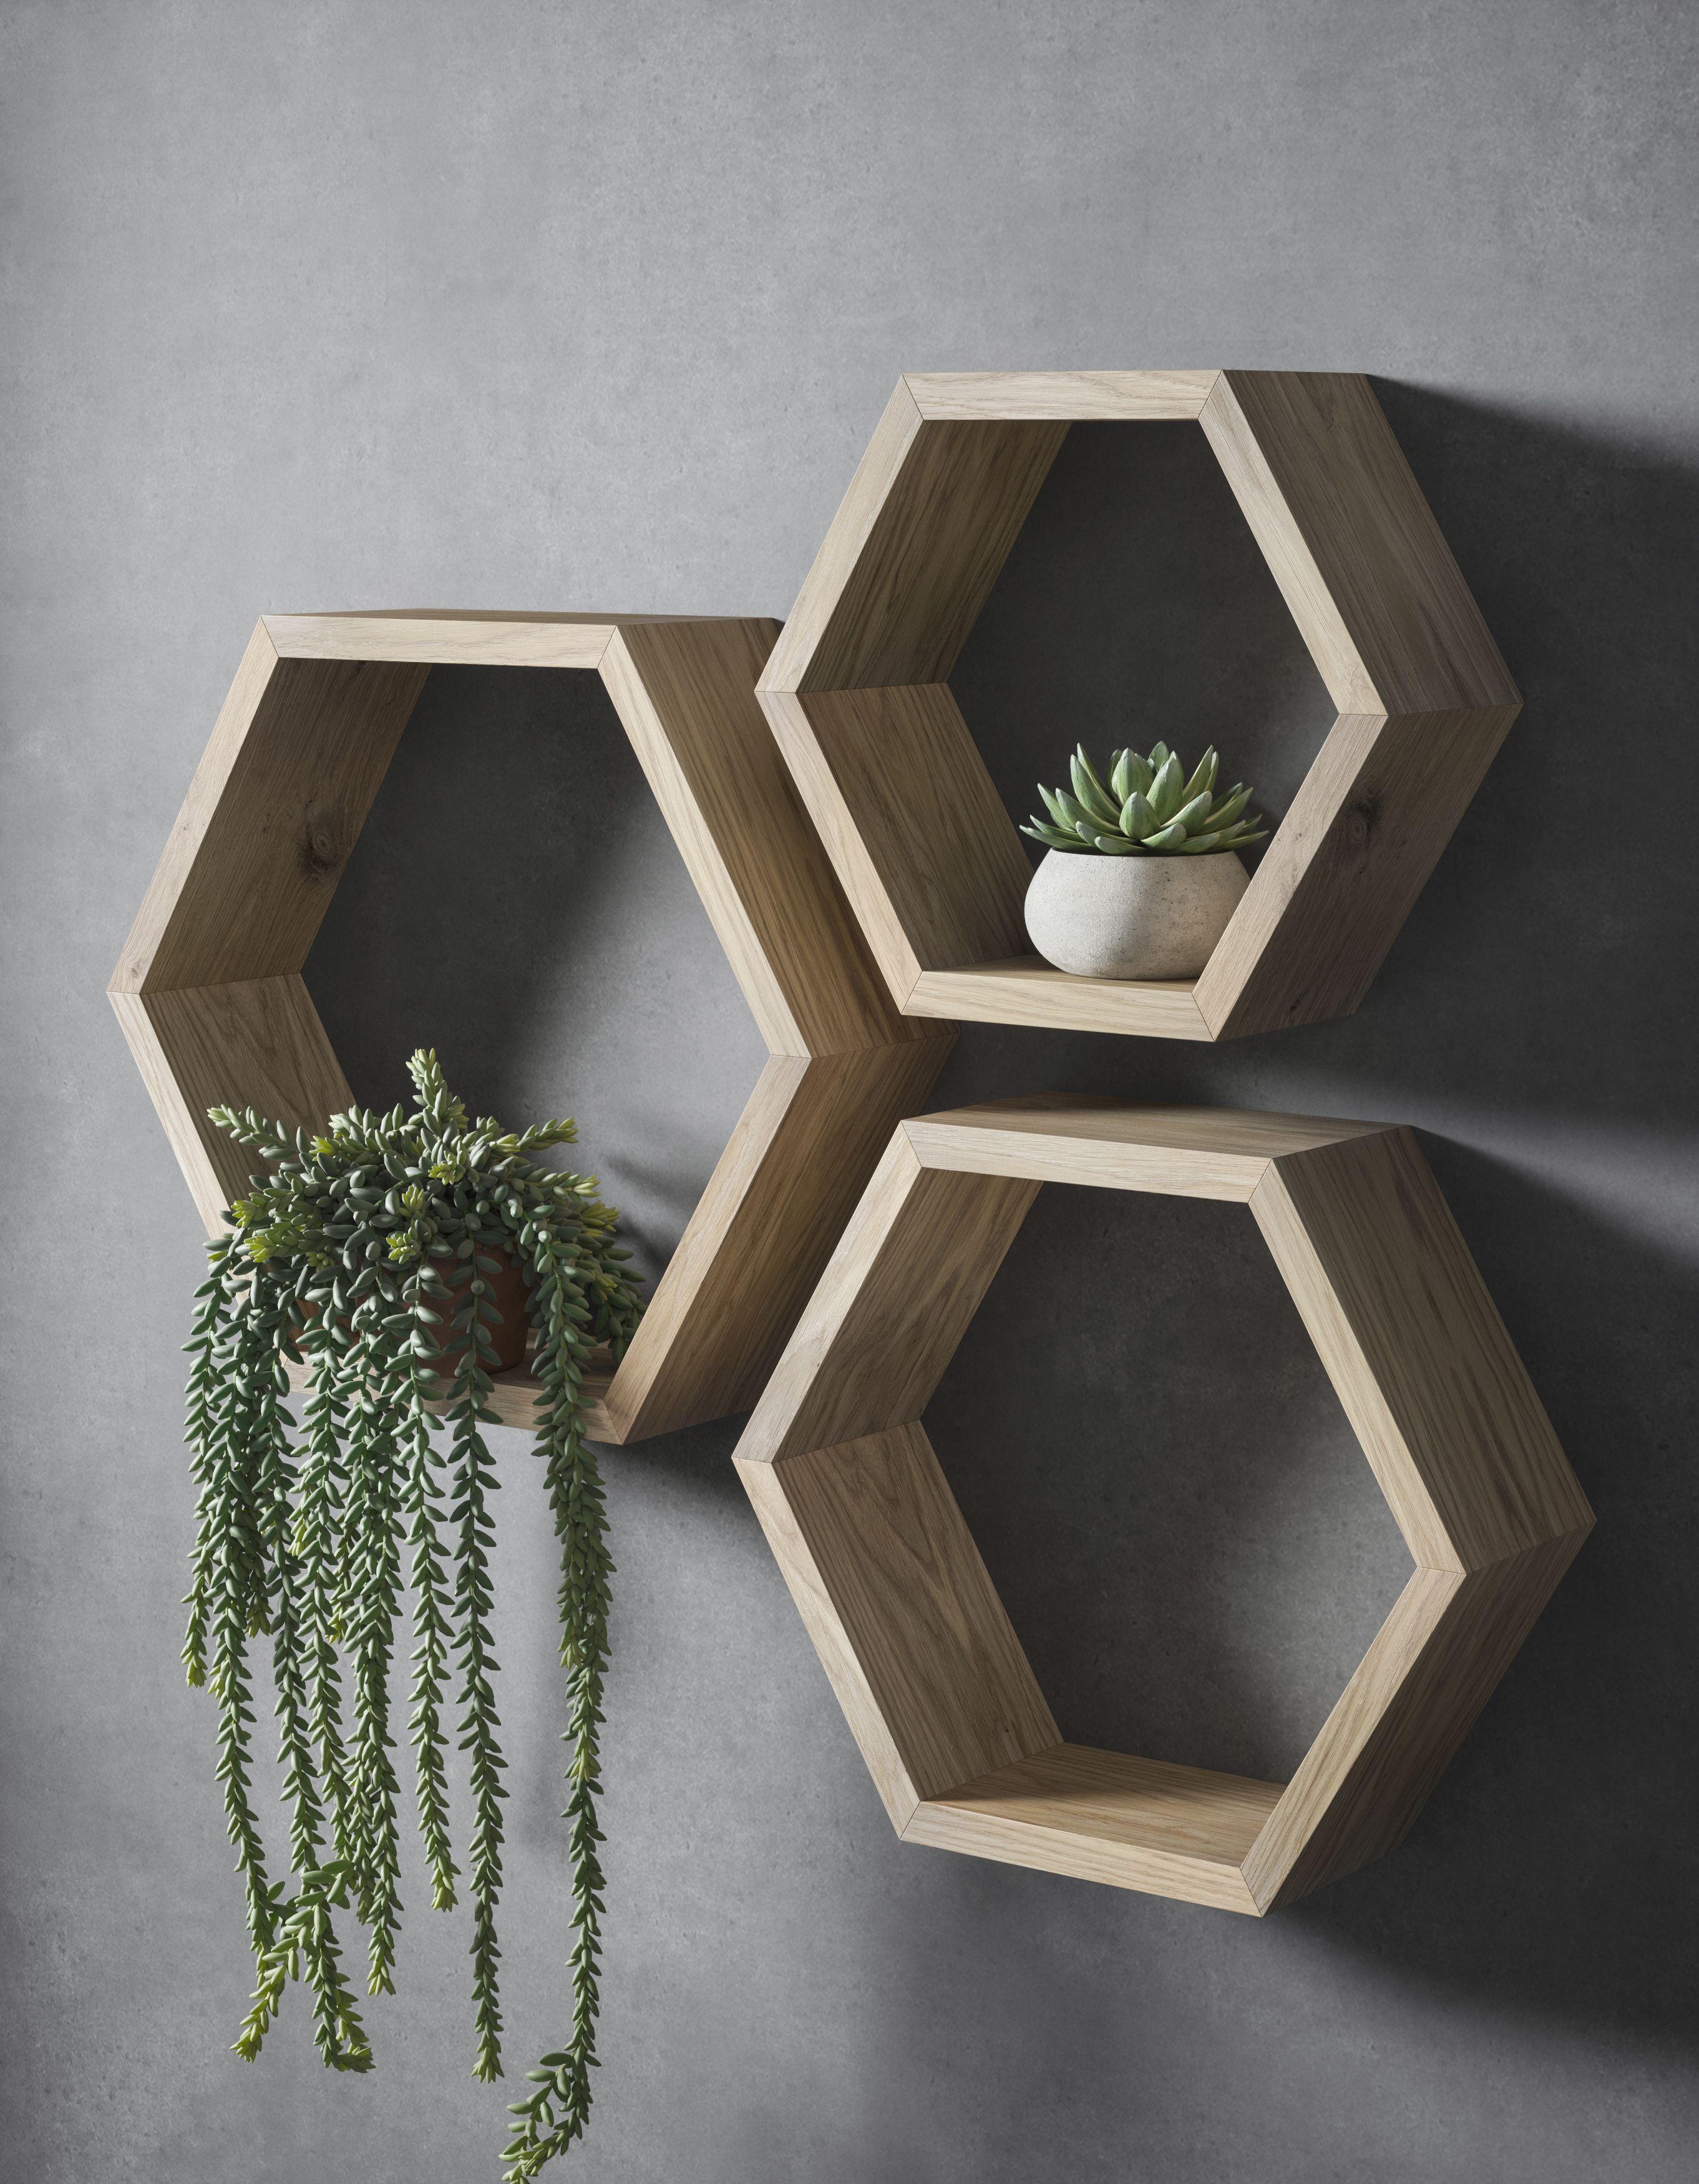 Hexagon Shelves Set Hexagon Shelf Set Geometric Shelf Etsy